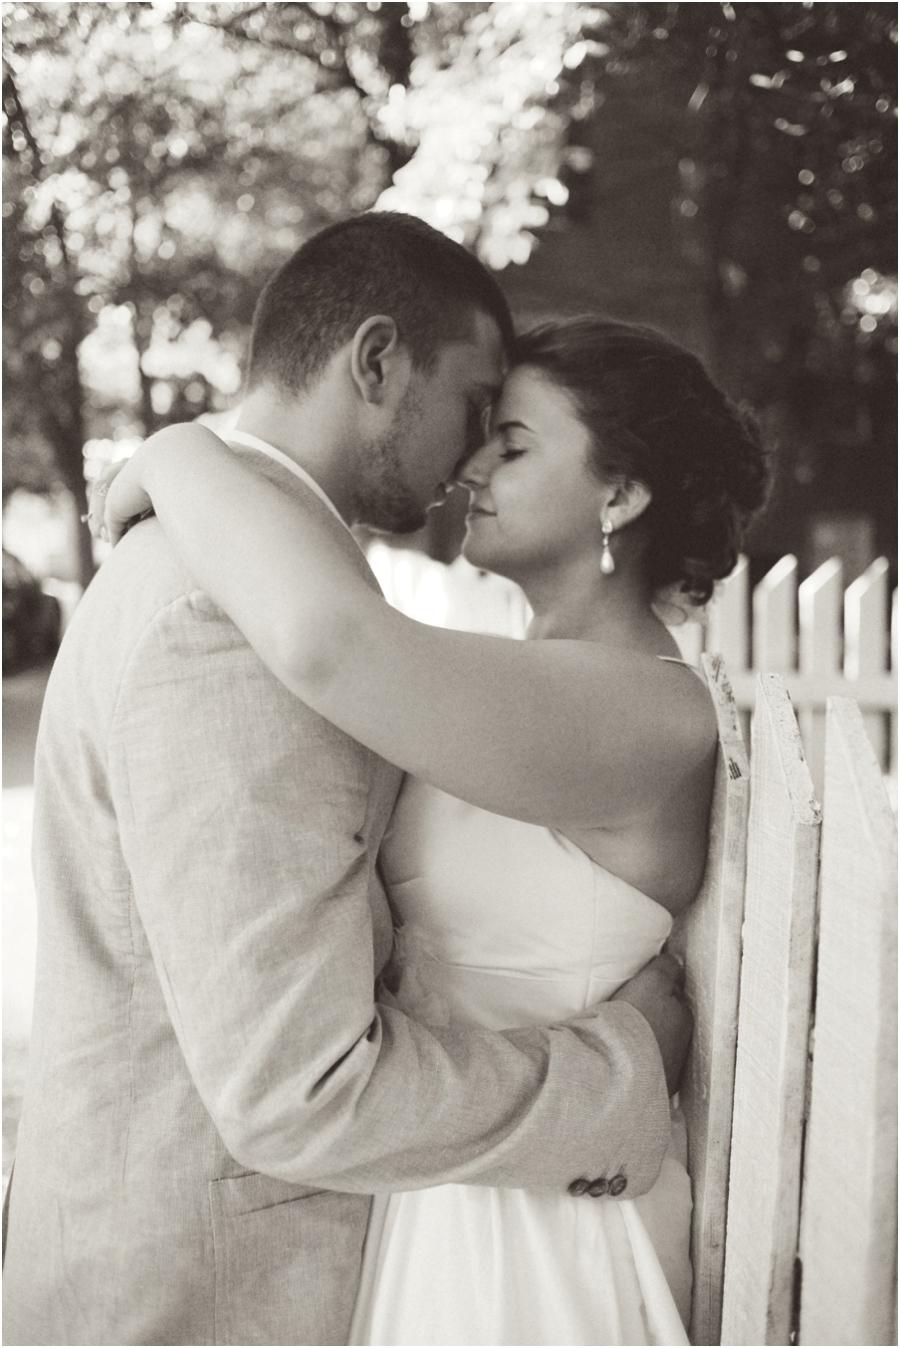 vintage wedding photography, winston salem nc